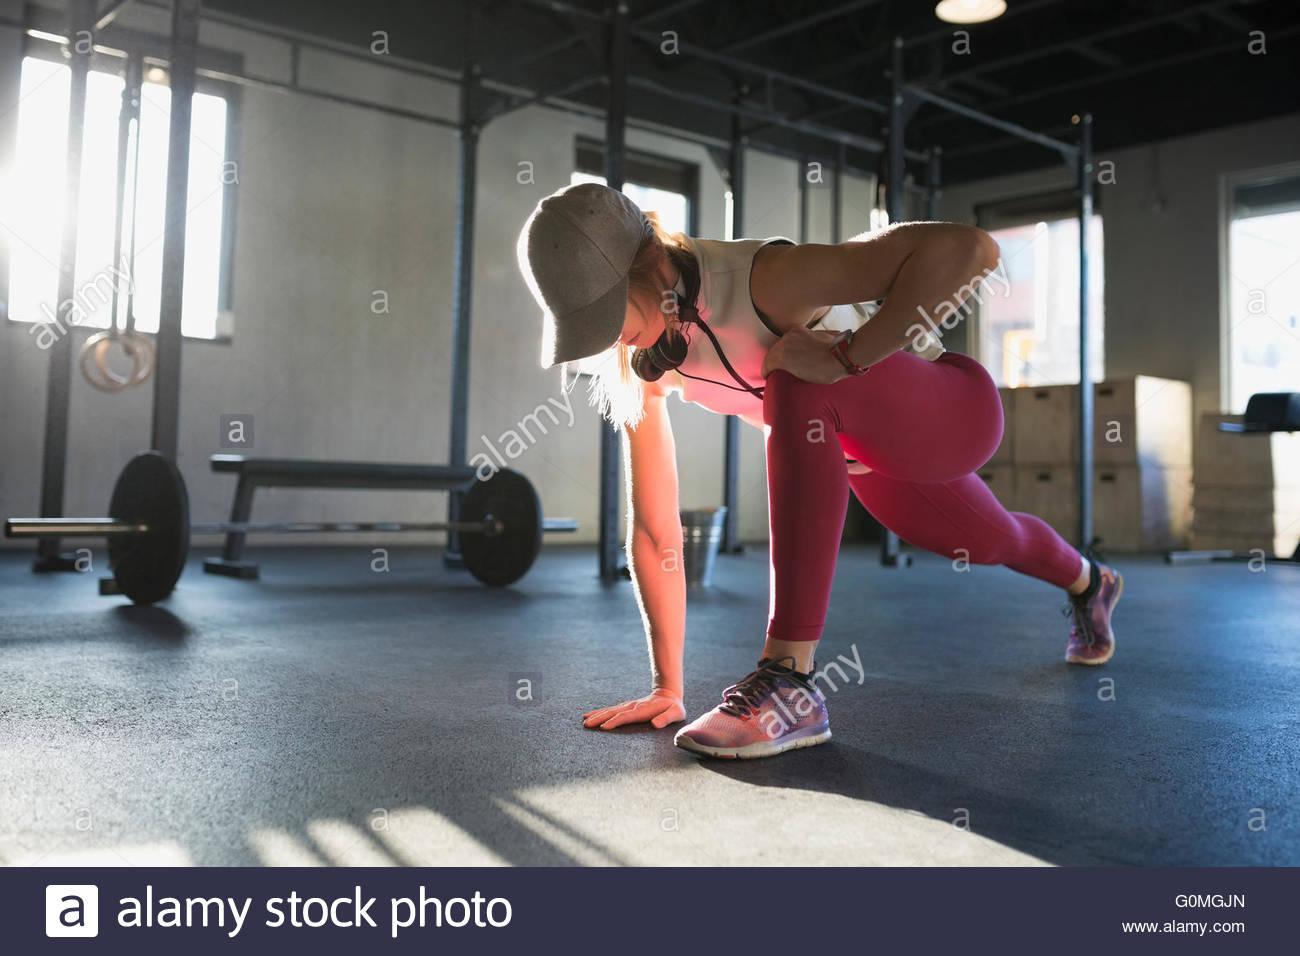 Frau tut Läufer Ausfallschritt in Turnhalle Stockbild